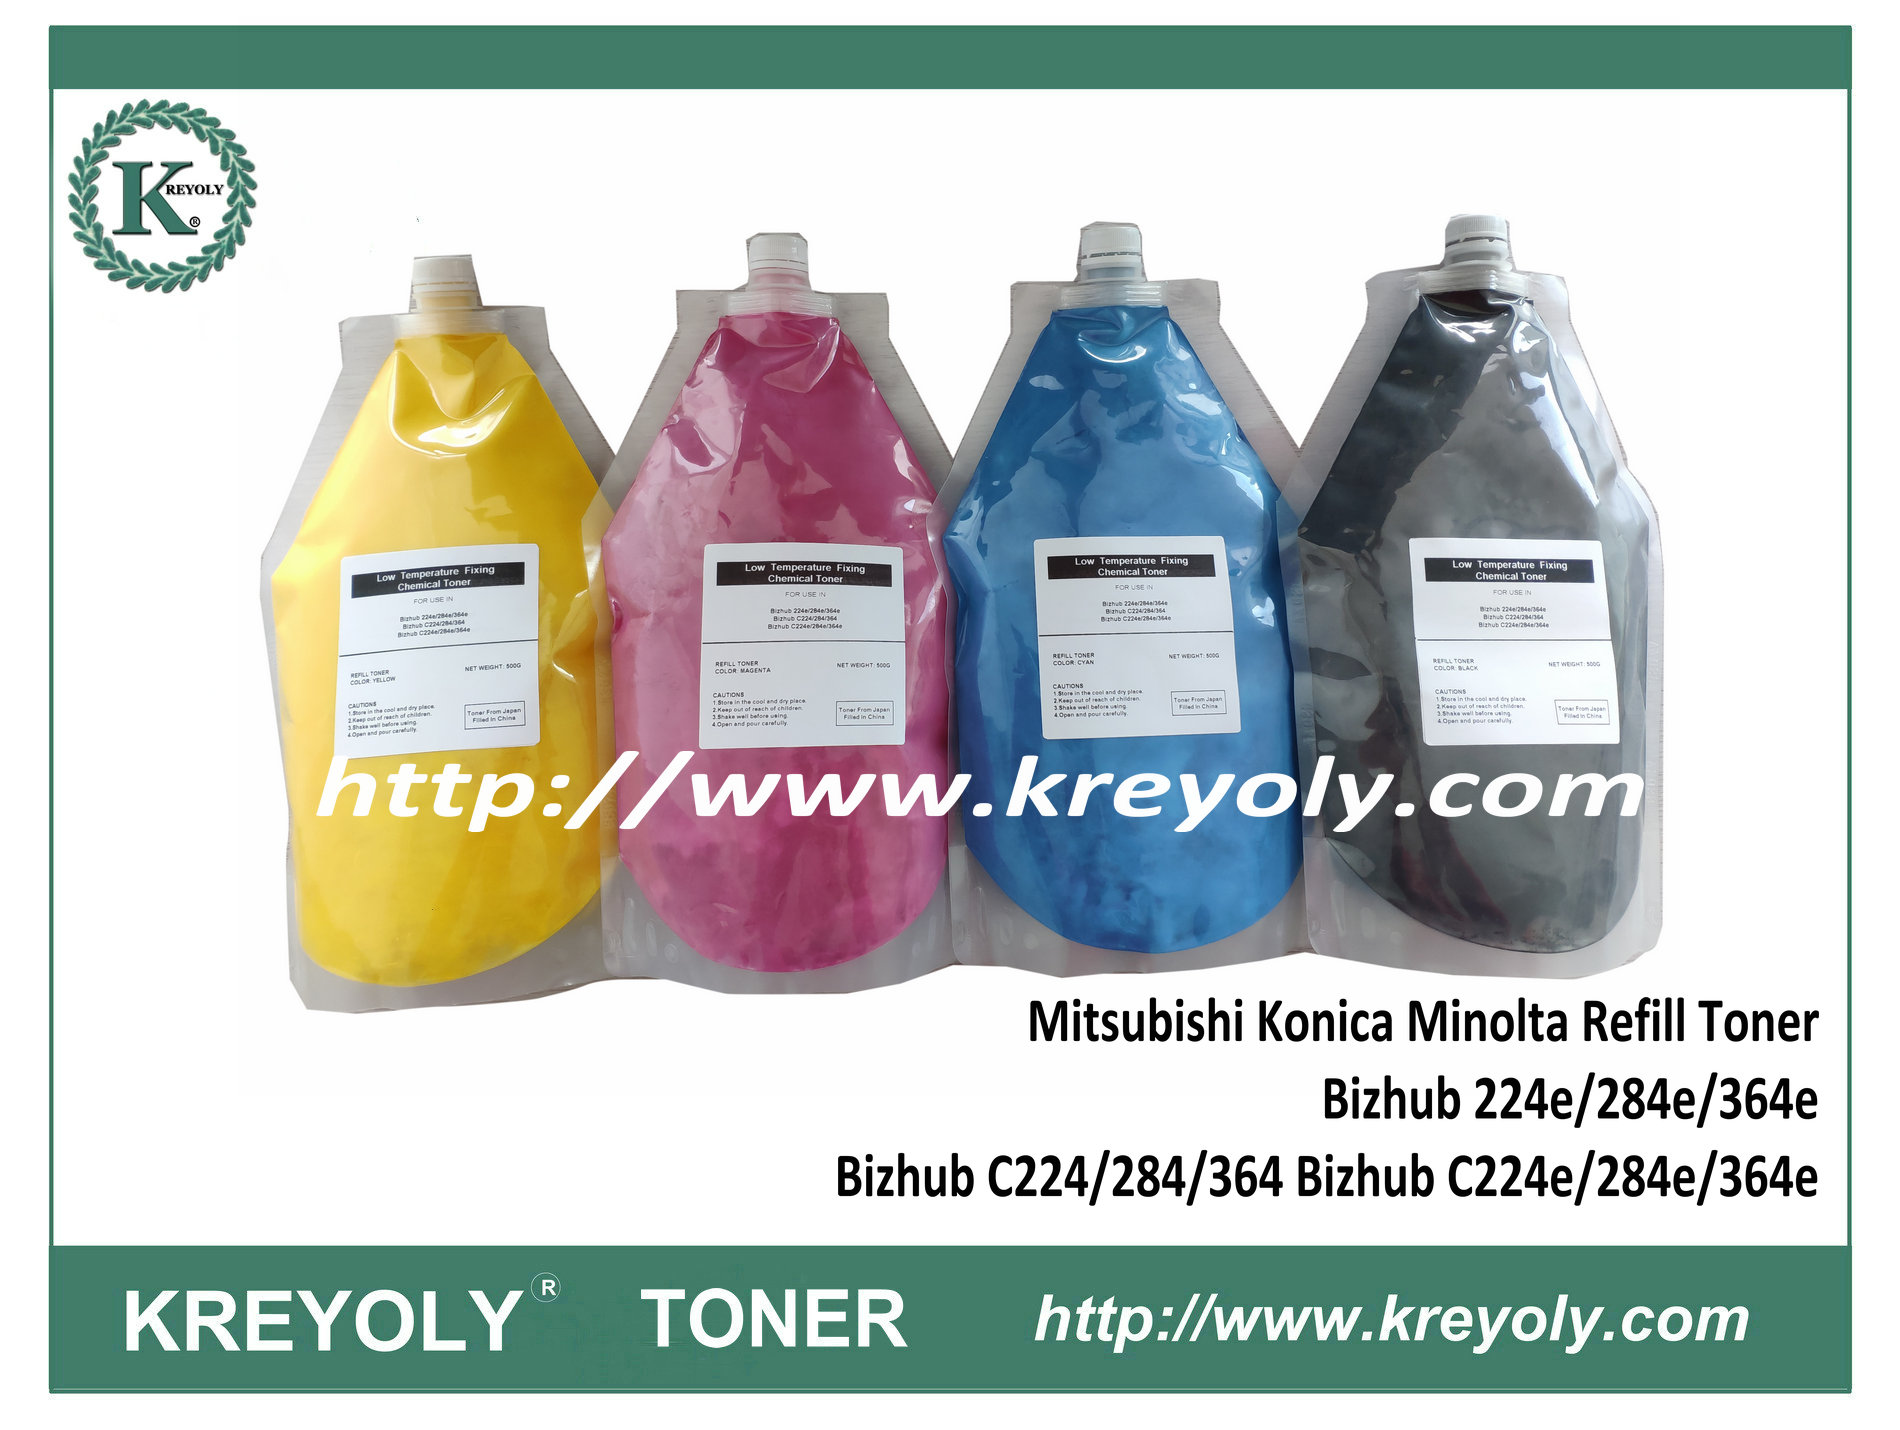 Mitsubishi Toner Refill Powder Konica Minolta Bizhub C224/284/364